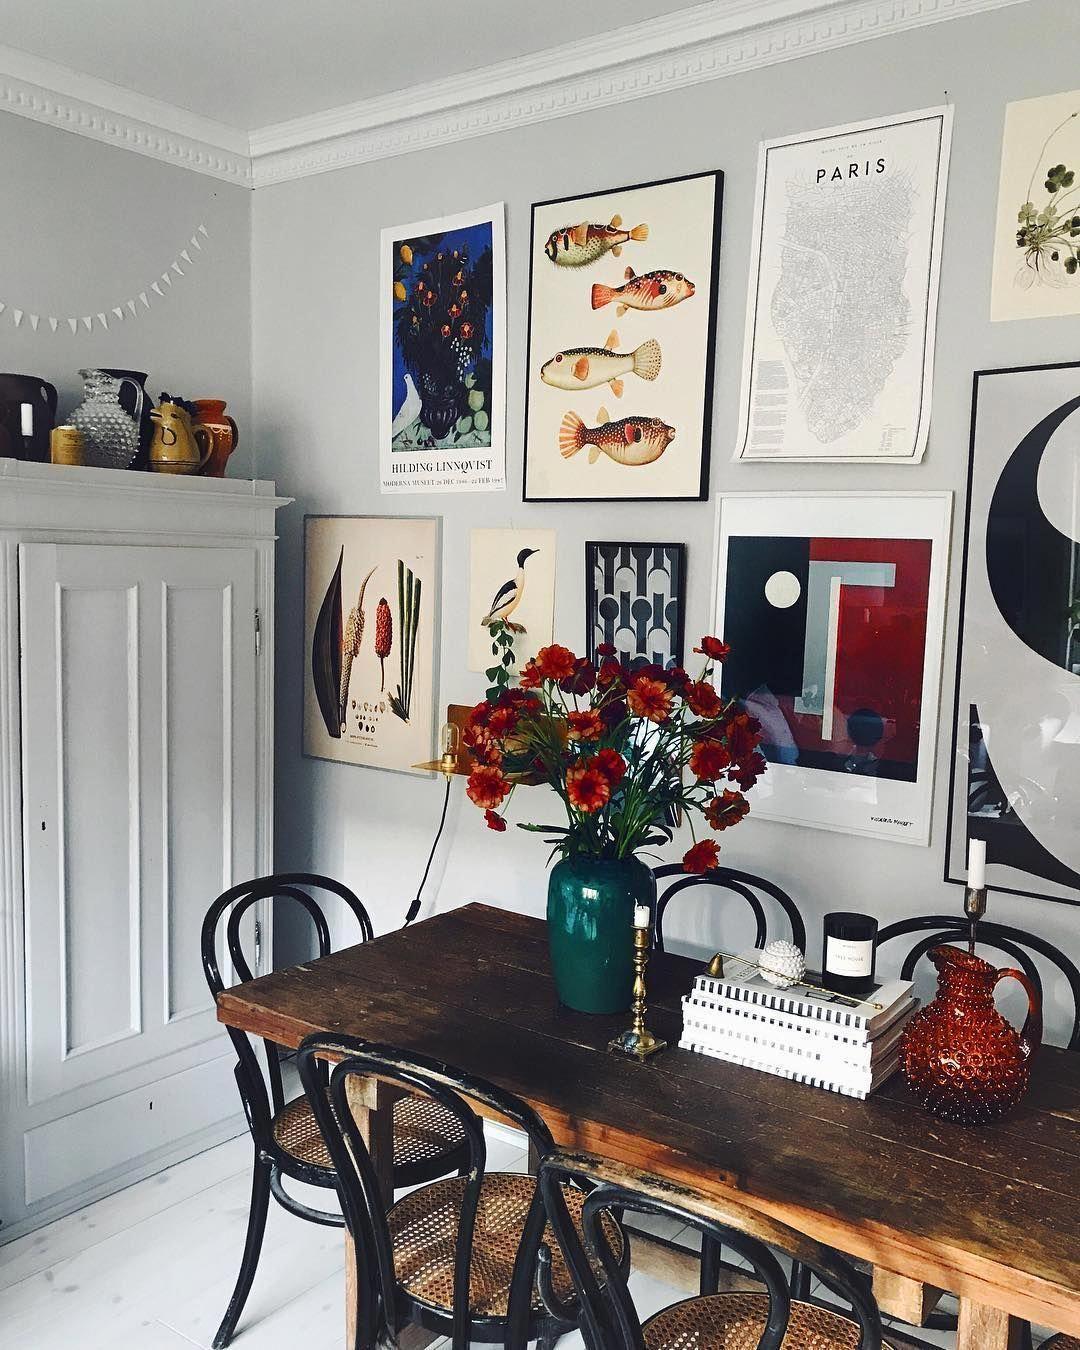 Charming And Cheap Decor Ideas Formal Dining Room: Dining Room Decor Ideas Uk #DiningRoomWallDecor #WallDecor